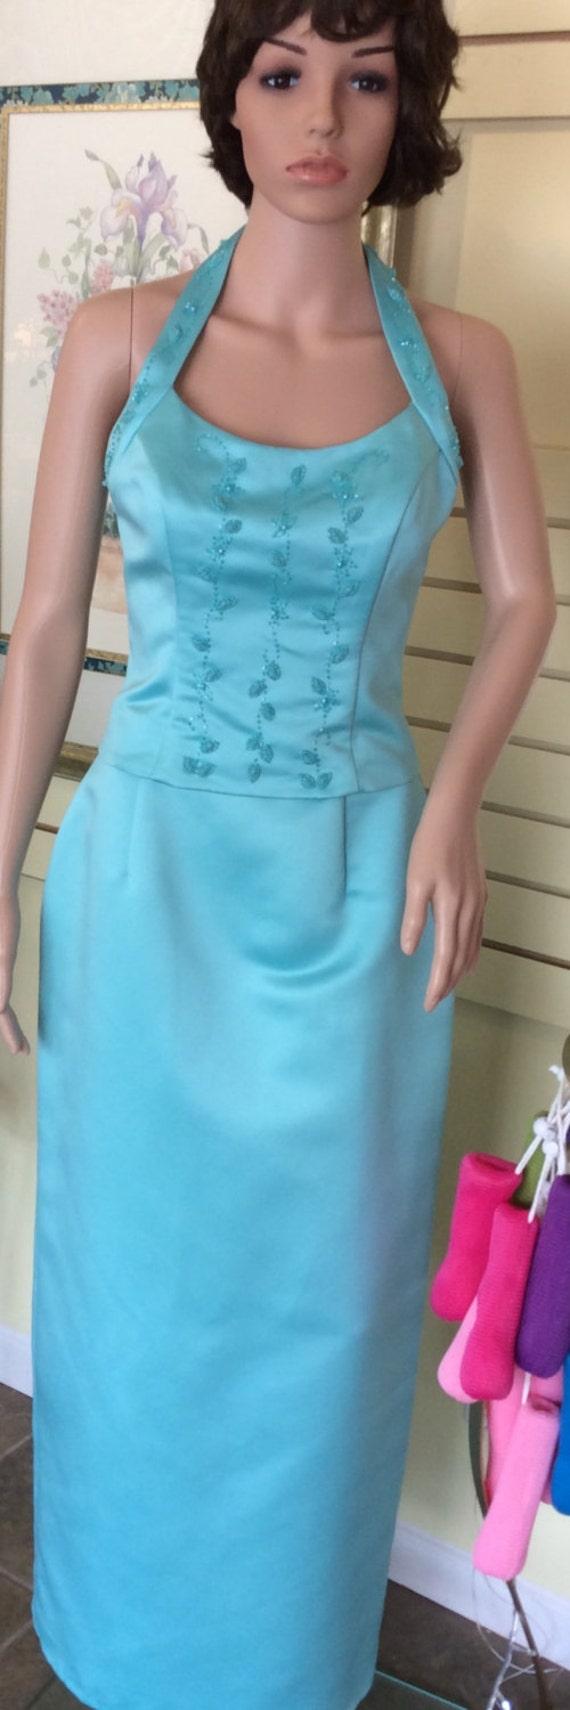 Pinky & Me Beaded Prom Dress Size 8 Bridesmaid Dress Evening